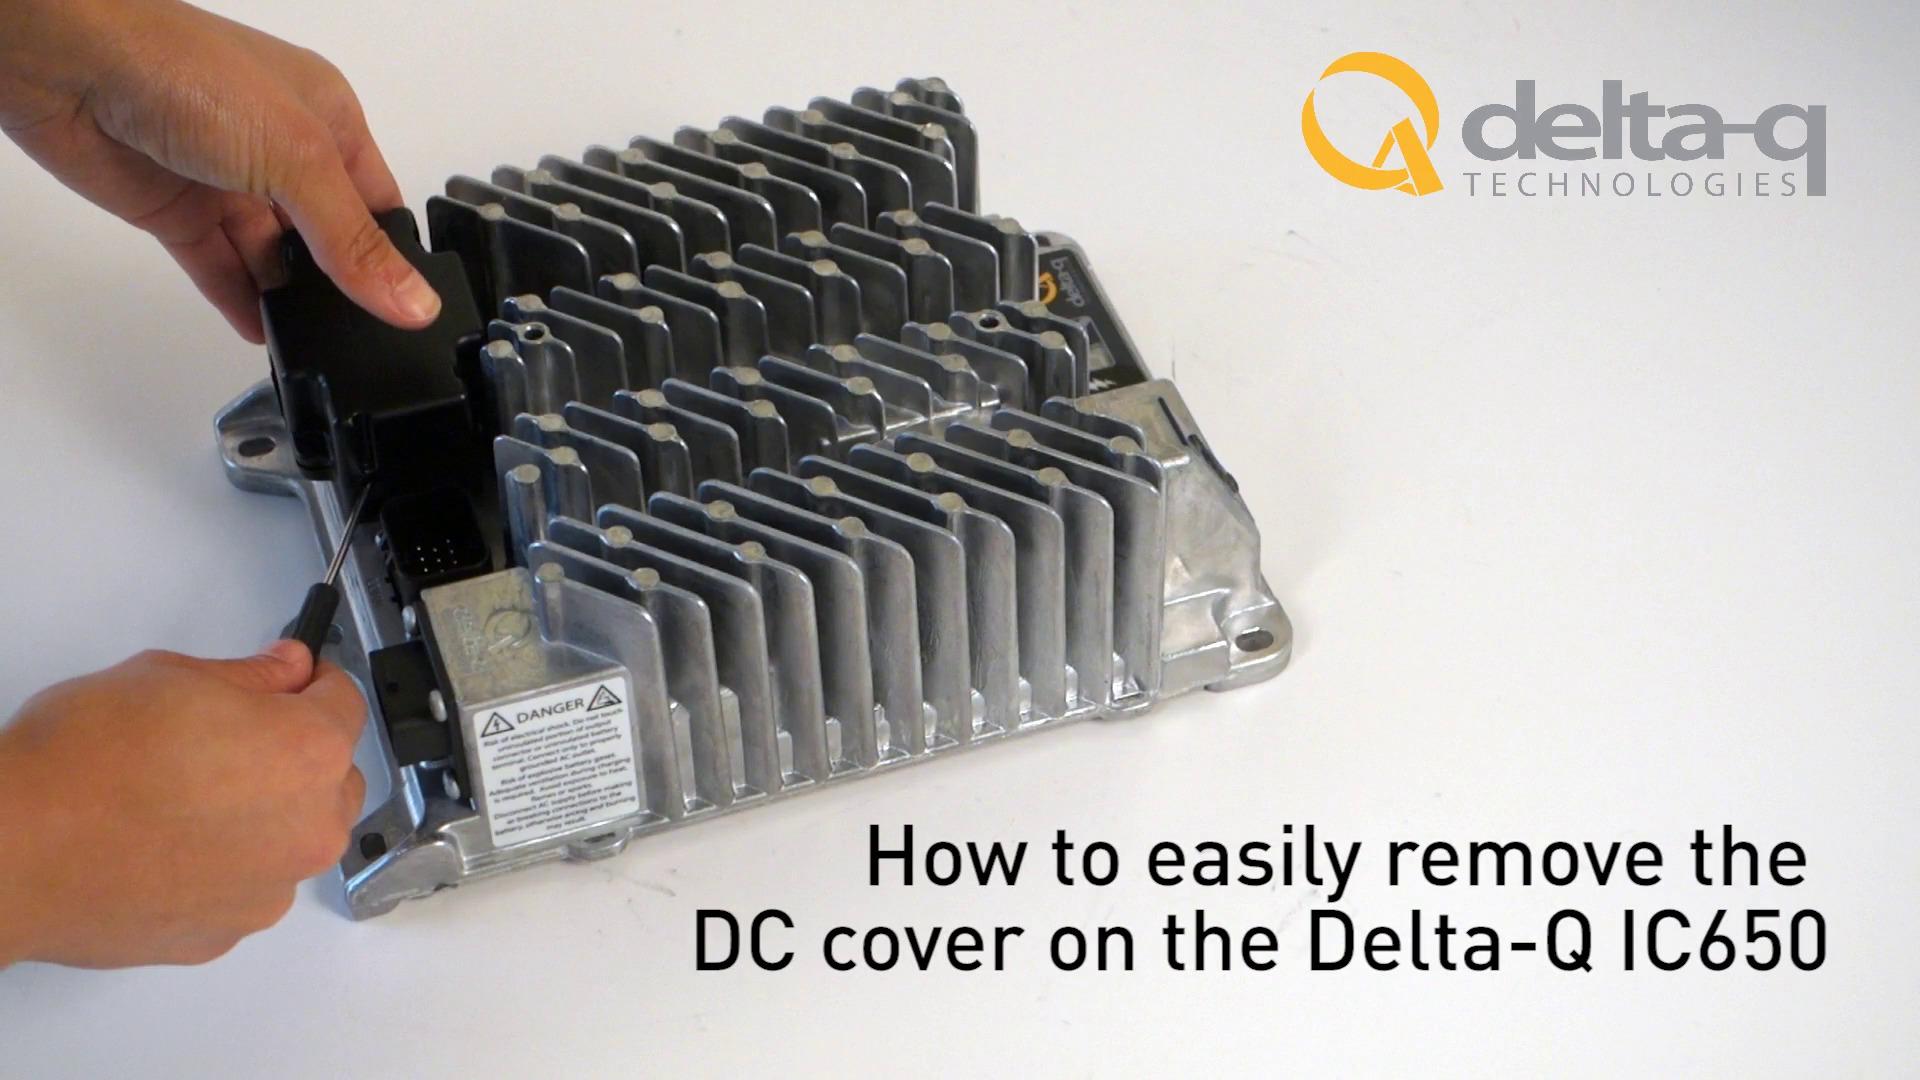 Support - Delta-Q Technologies